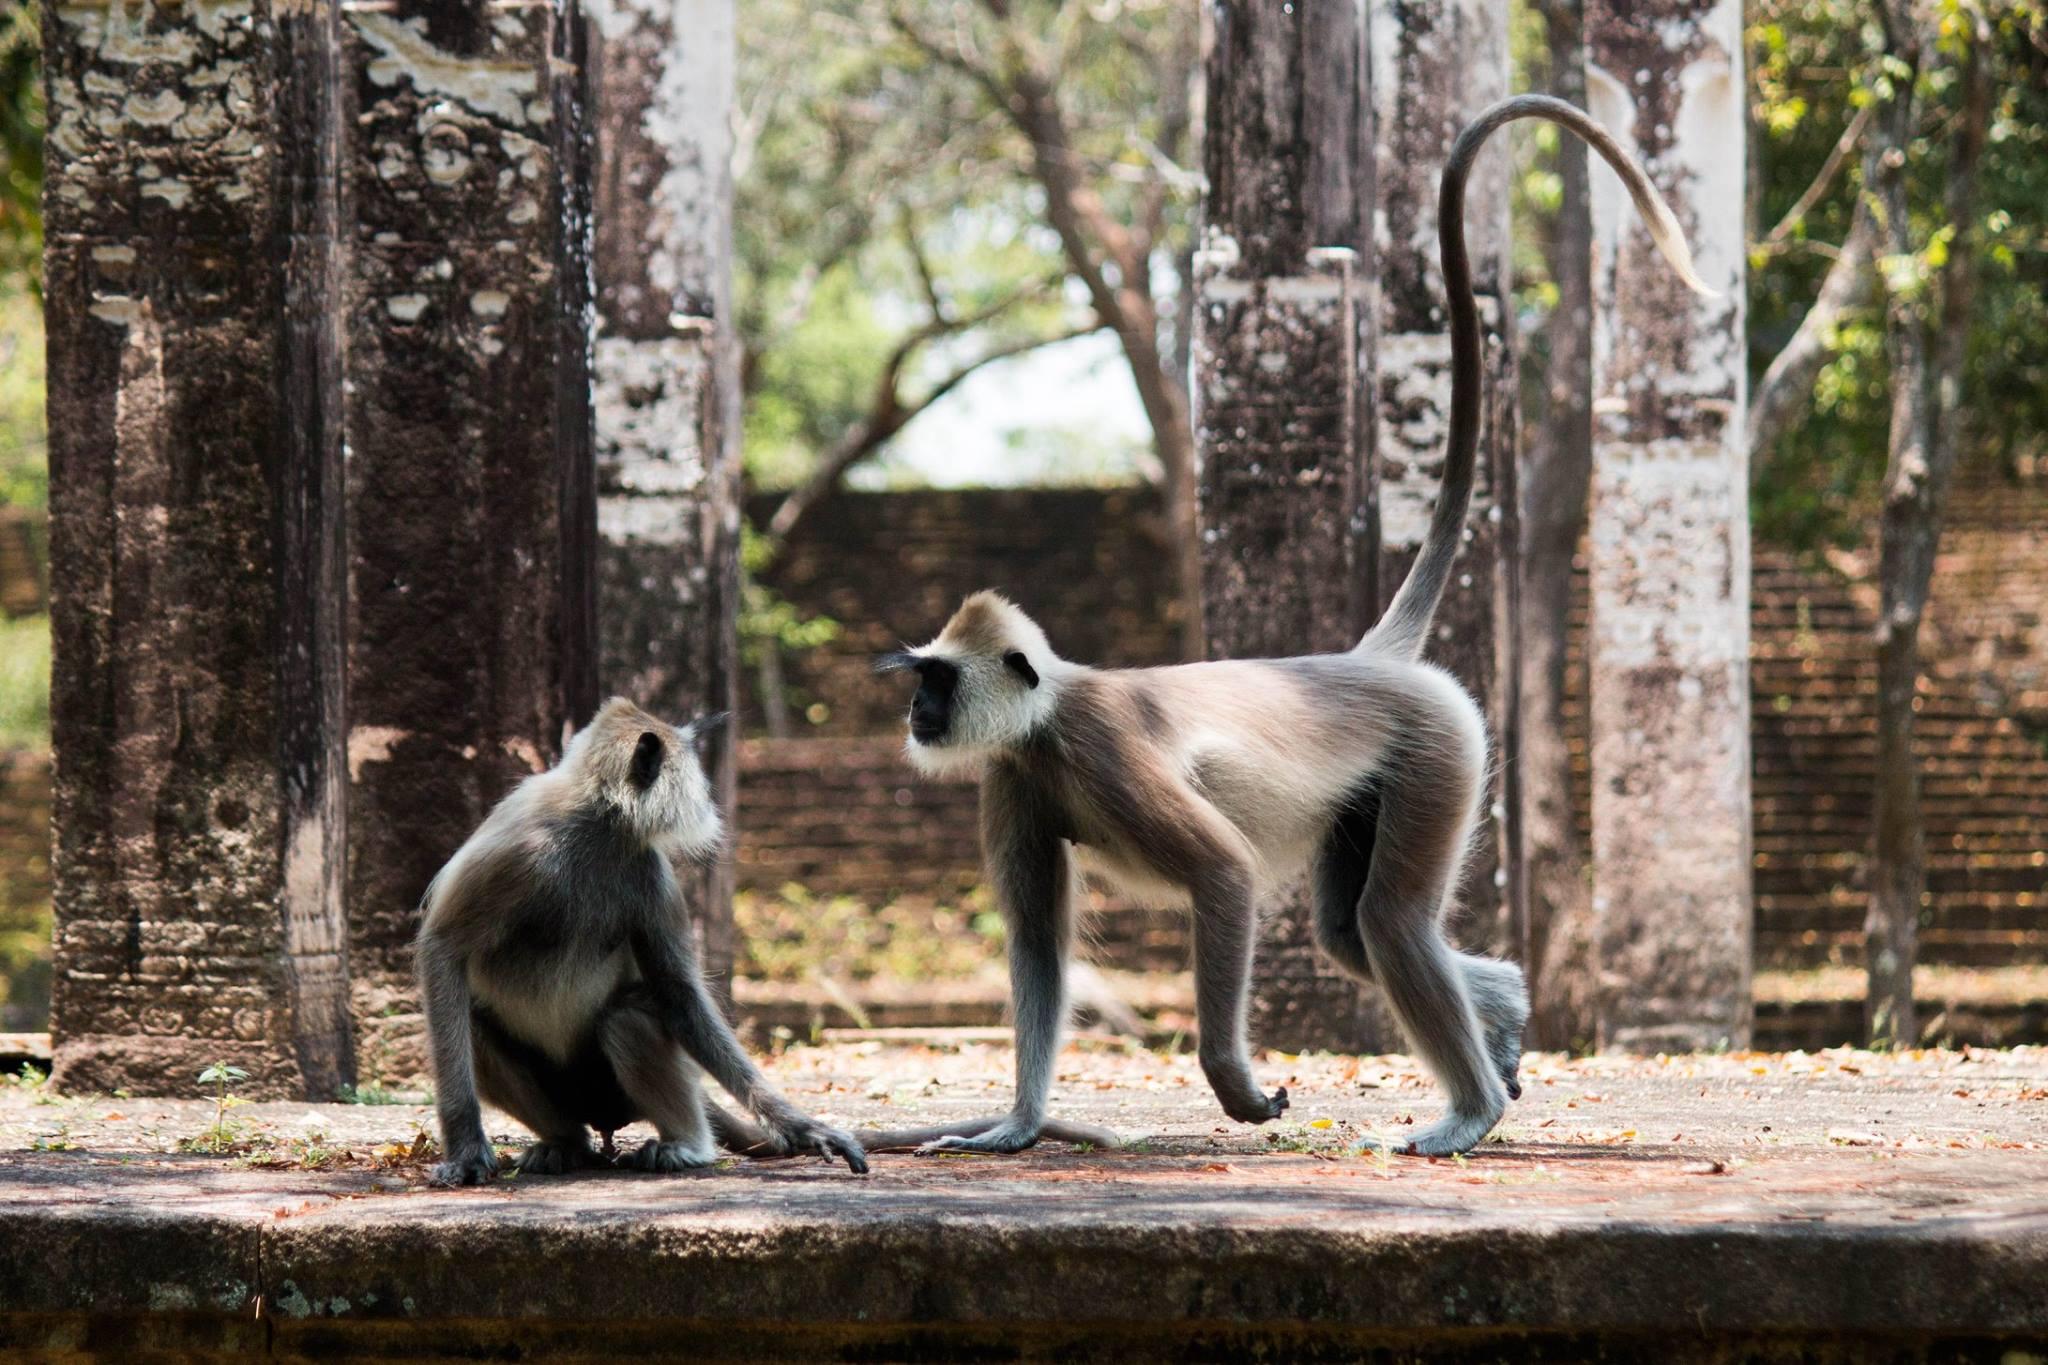 invite-to-paradise-sri-lanka-and-maldives-specialists-travel-agent-tour-operator-customer-review-feedback-joel-rhian-monkey-2.jpg